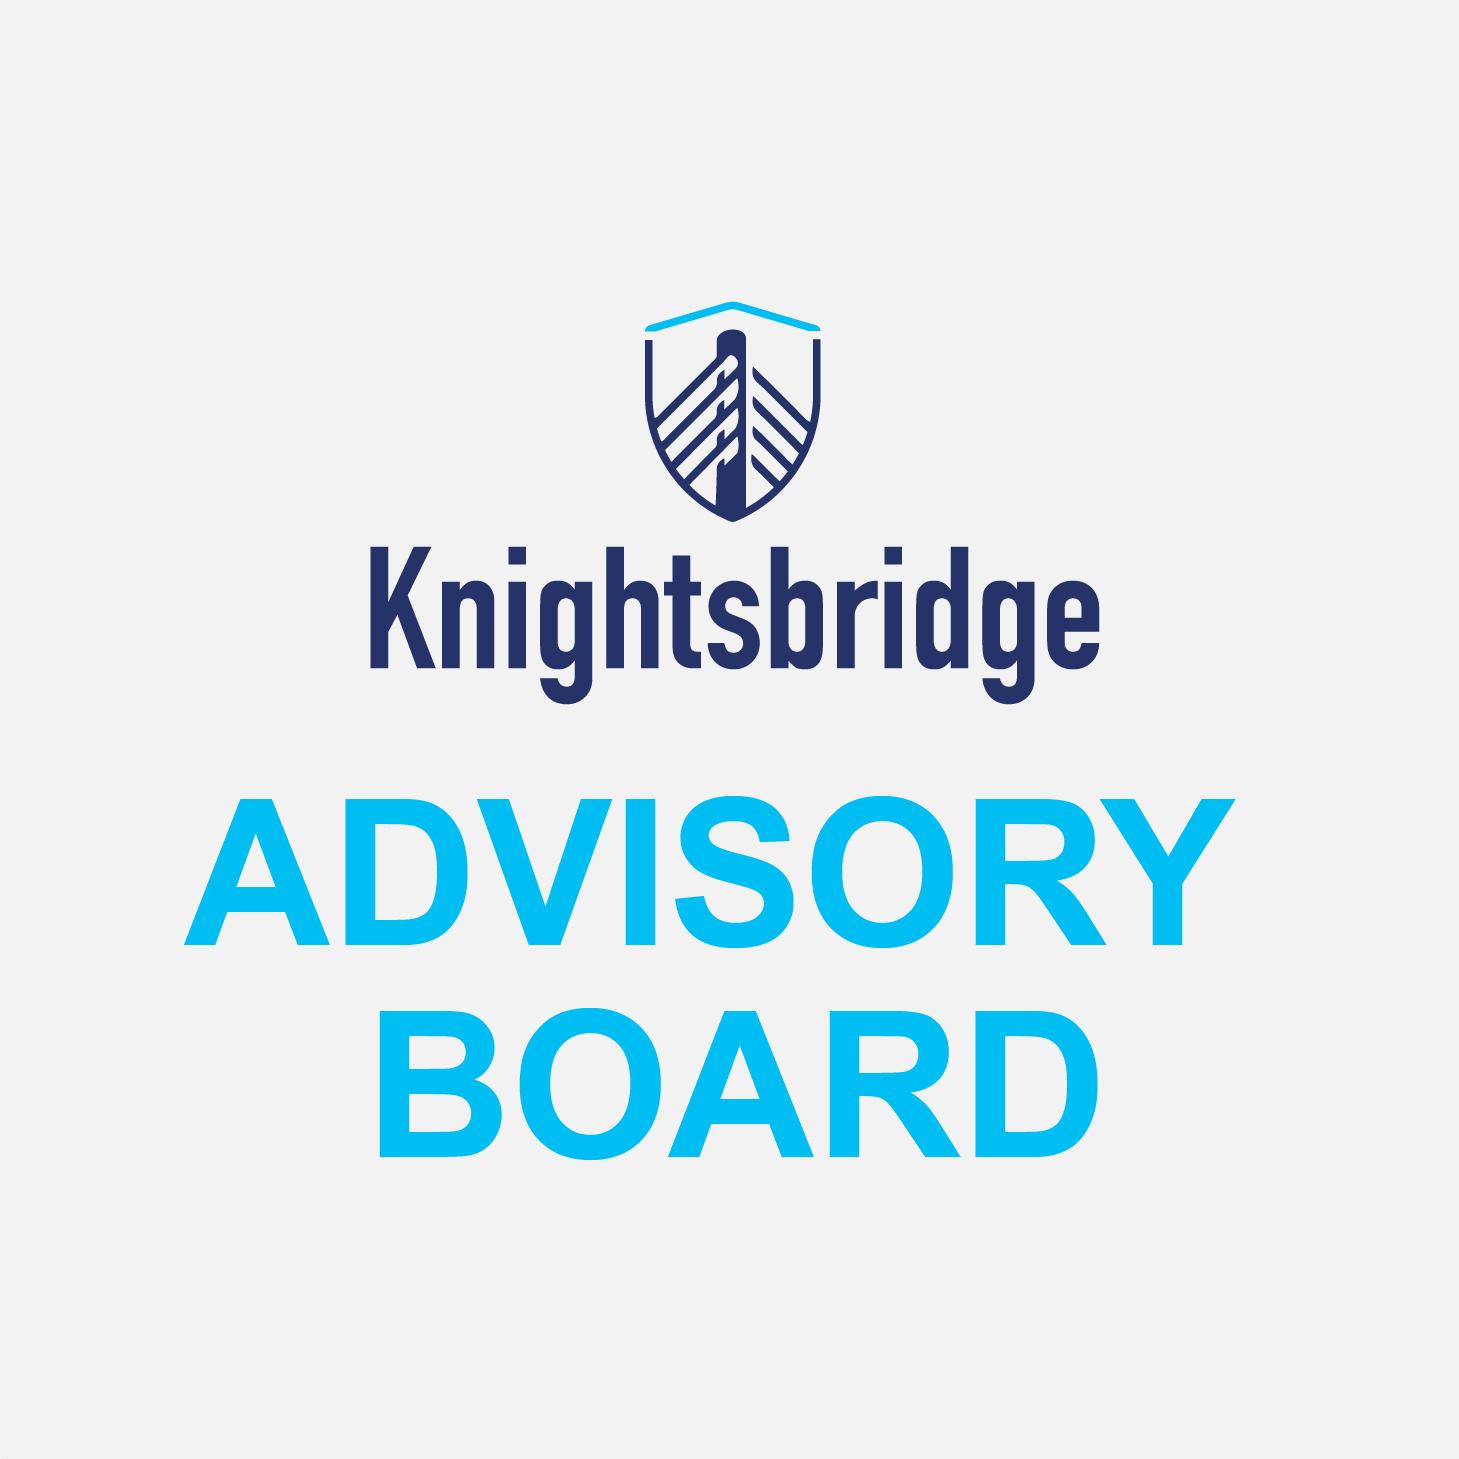 Knightsbridge_AdvisoryBoard-02.png